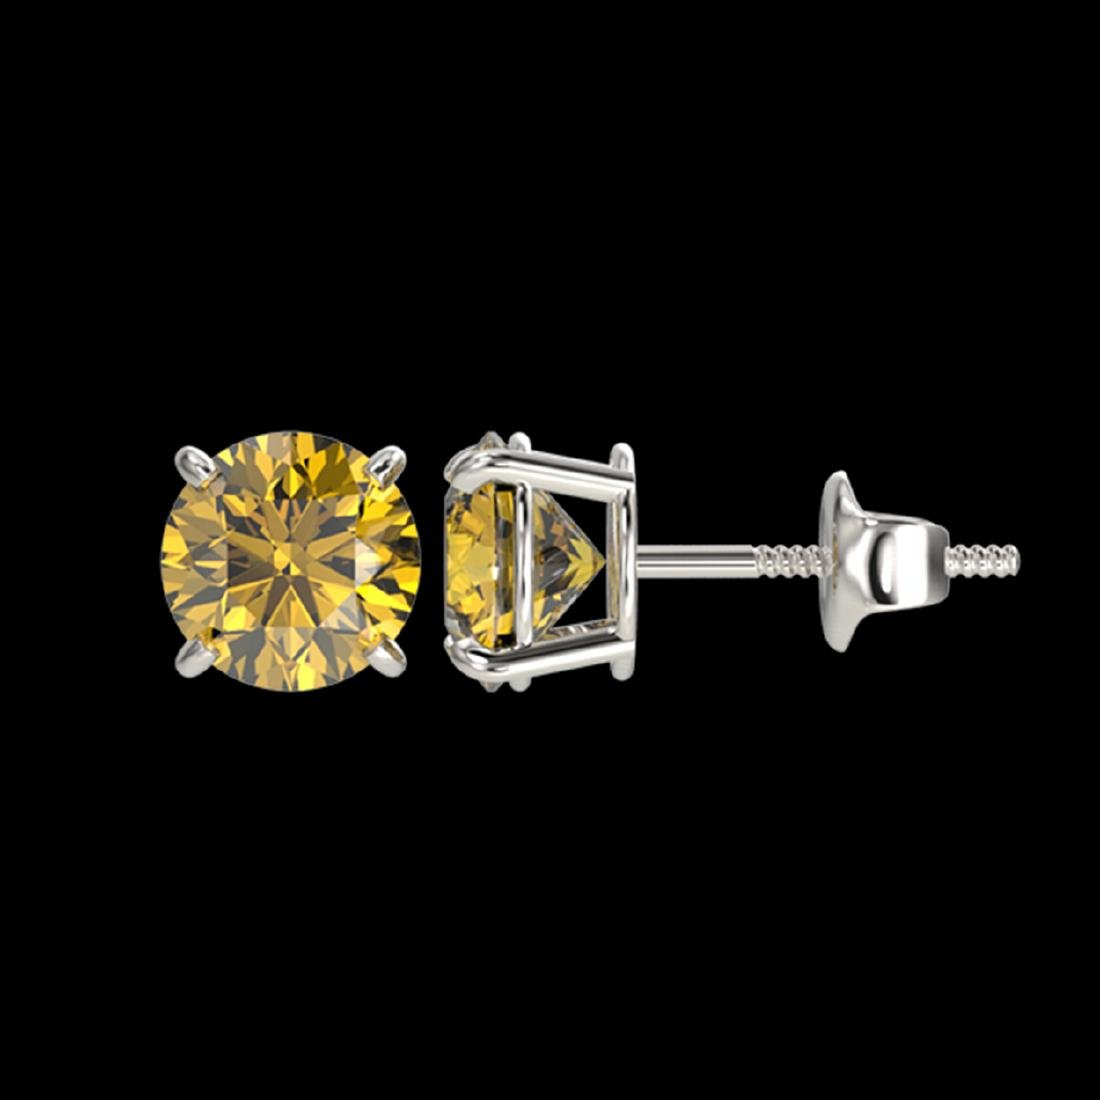 1.54 ctw Intense Yellow Diamond Stud Earrings 10K White - 2